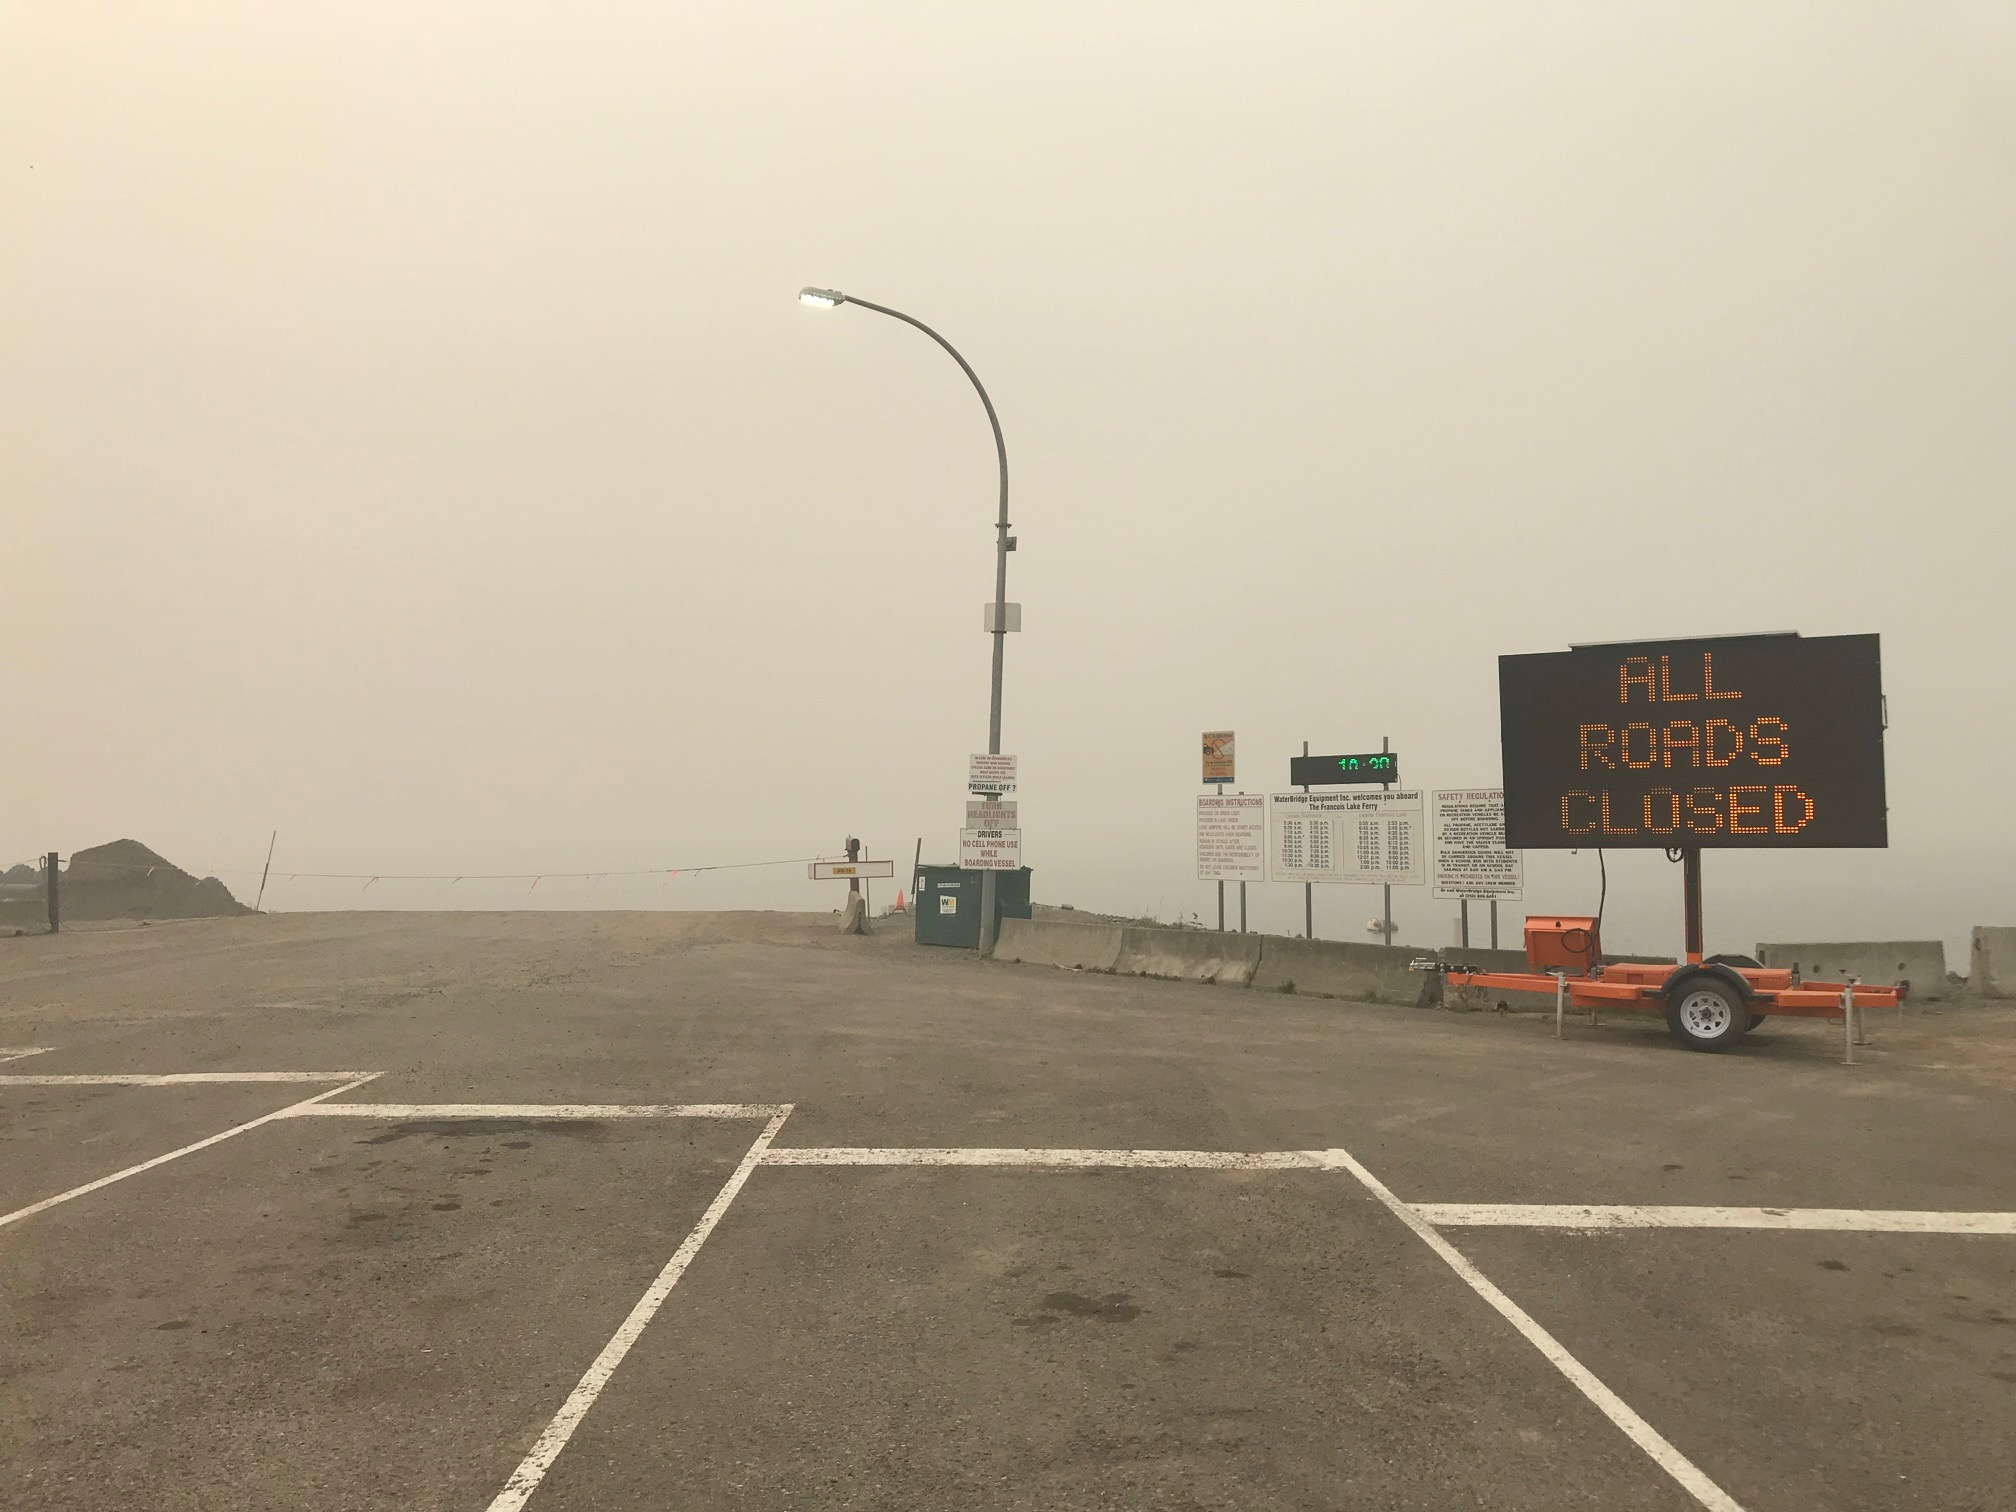 https://0901.nccdn.net/4_2/000/000/050/773/aug-17-francois-lake-north-terminal.jpg